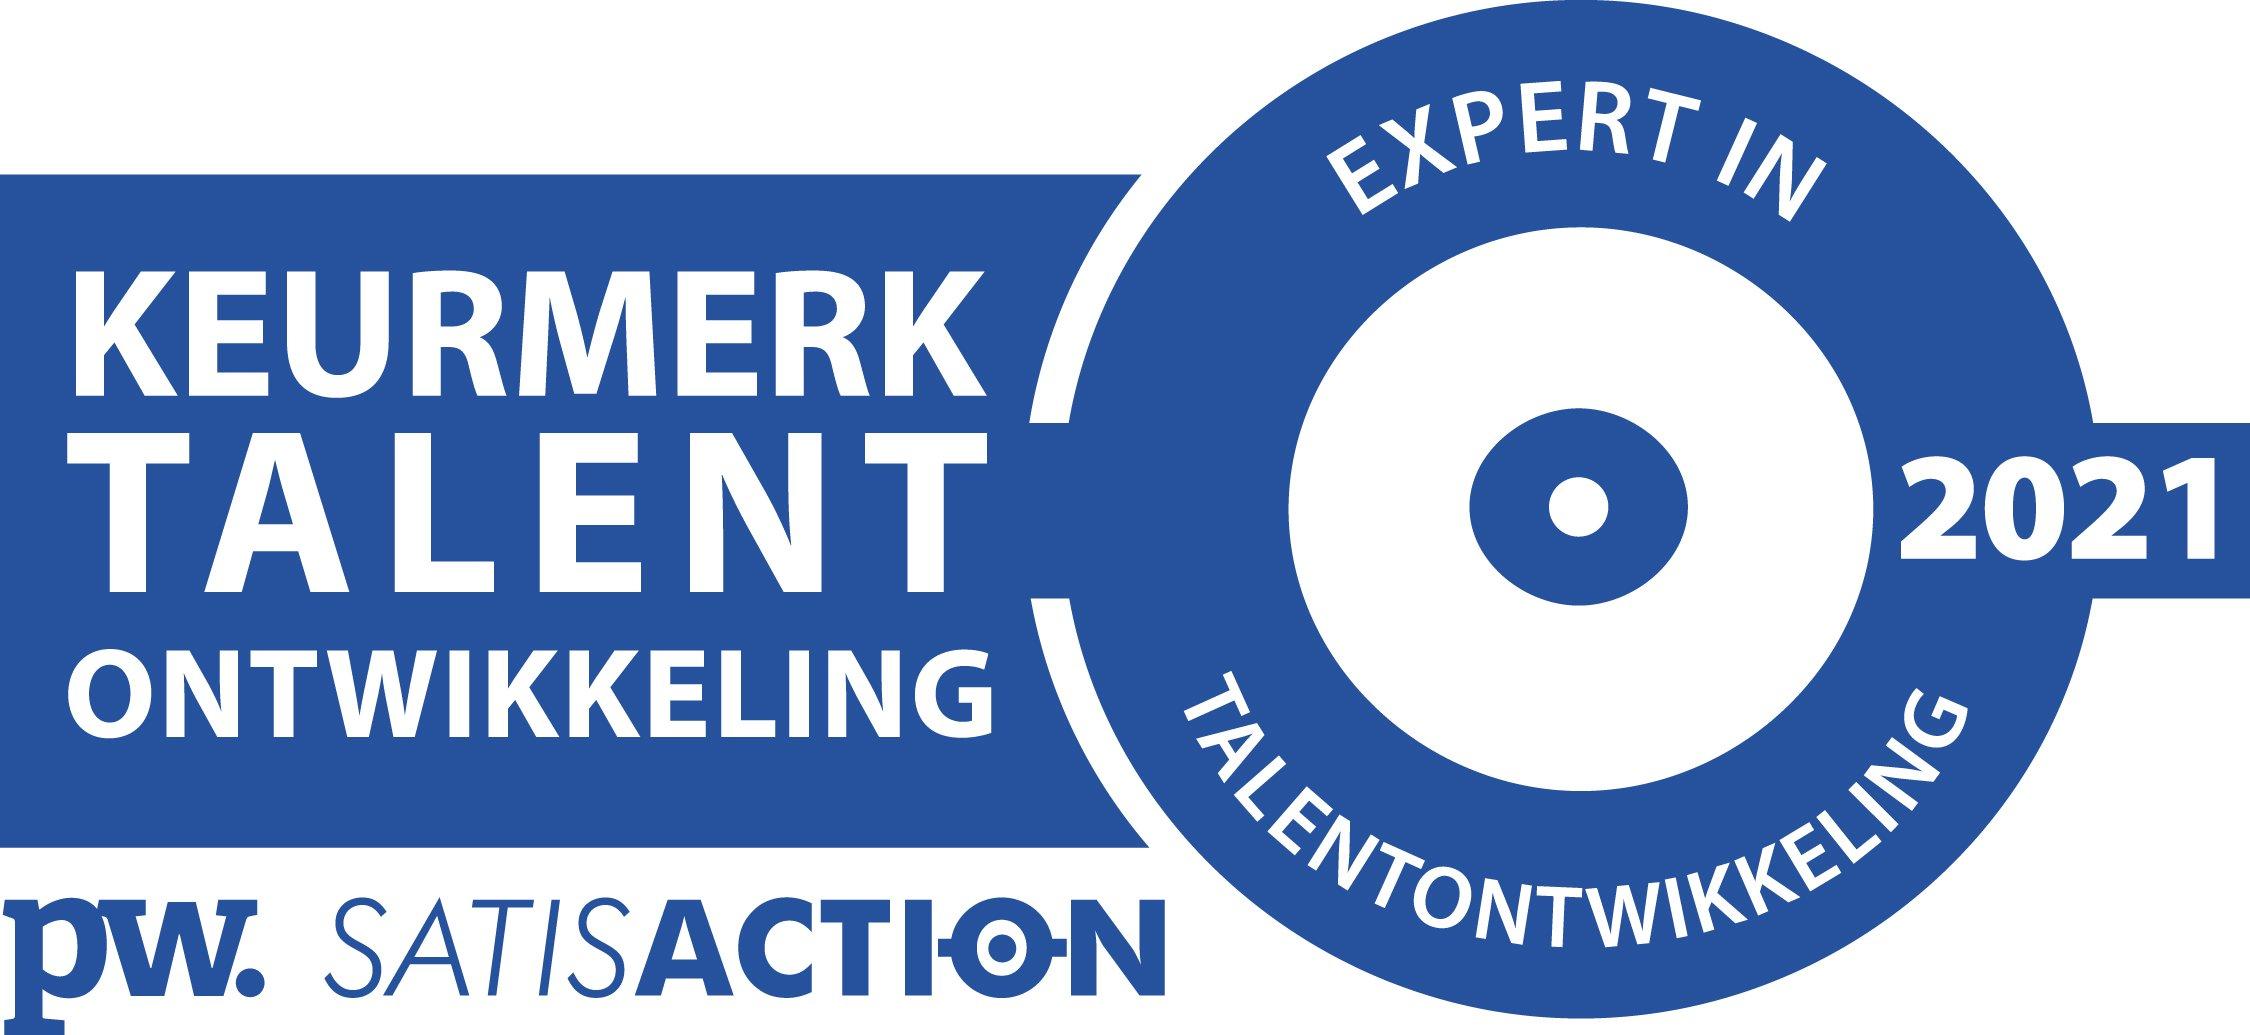 Keurmerk_Talentontwikkeling_NL_2021